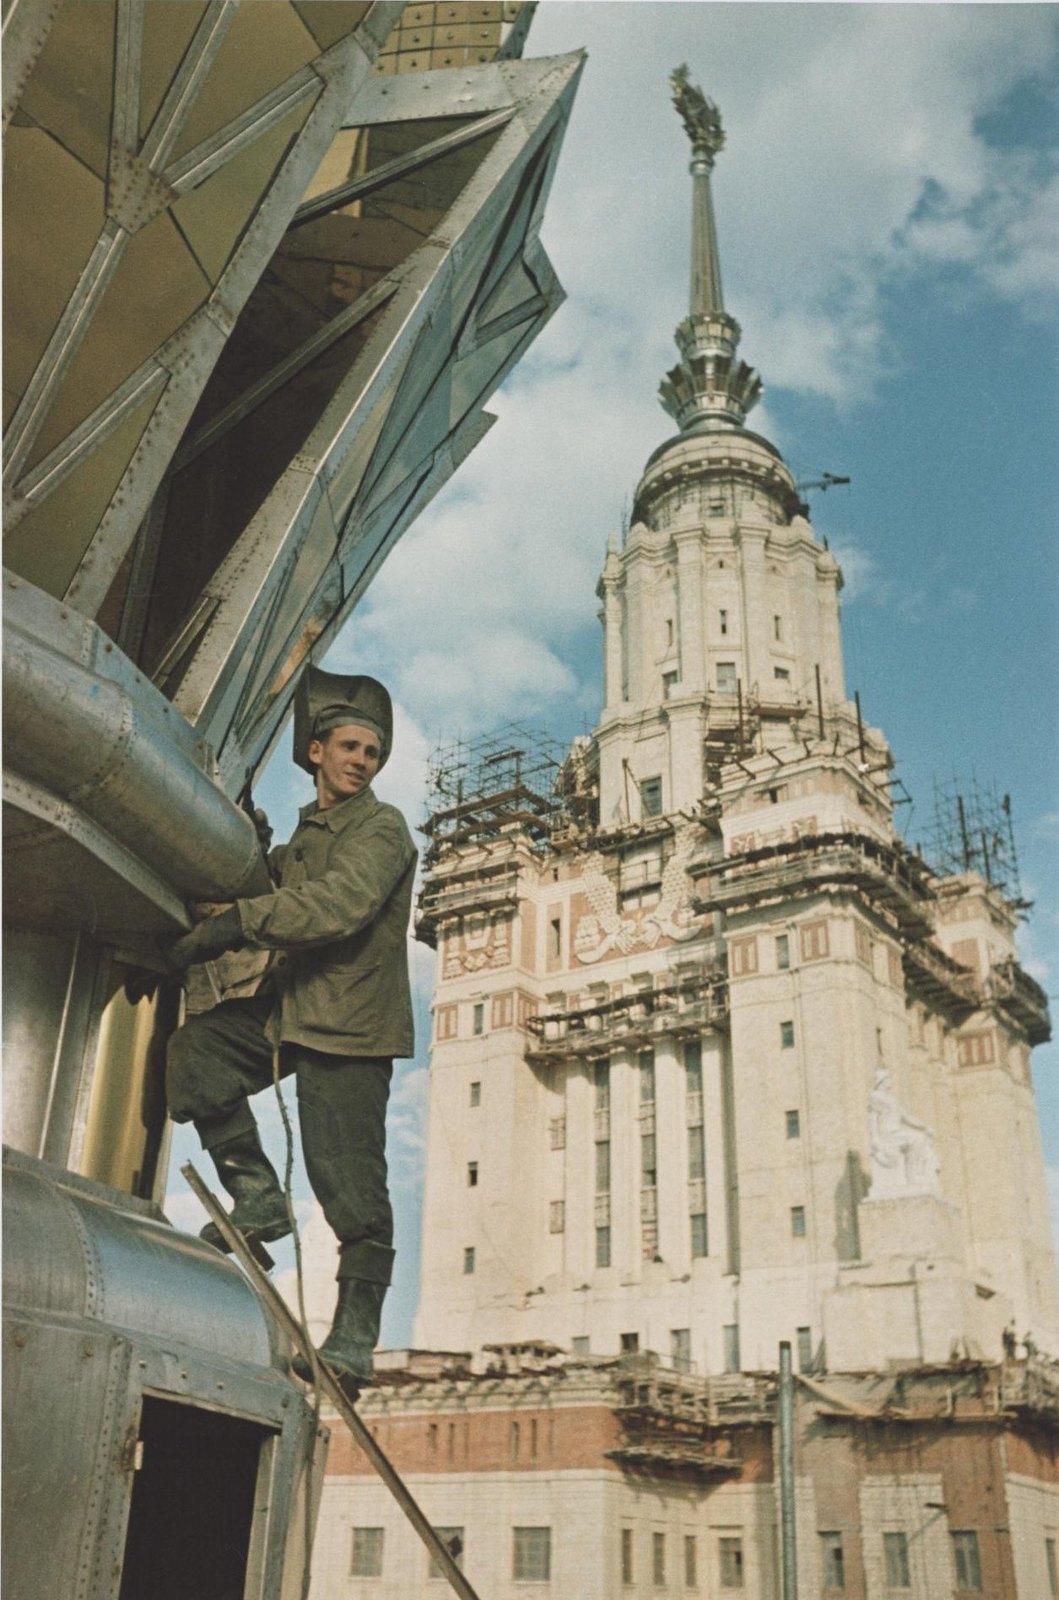 1952. МГУ на Ленинских горах. Сварщик-верхолаз.